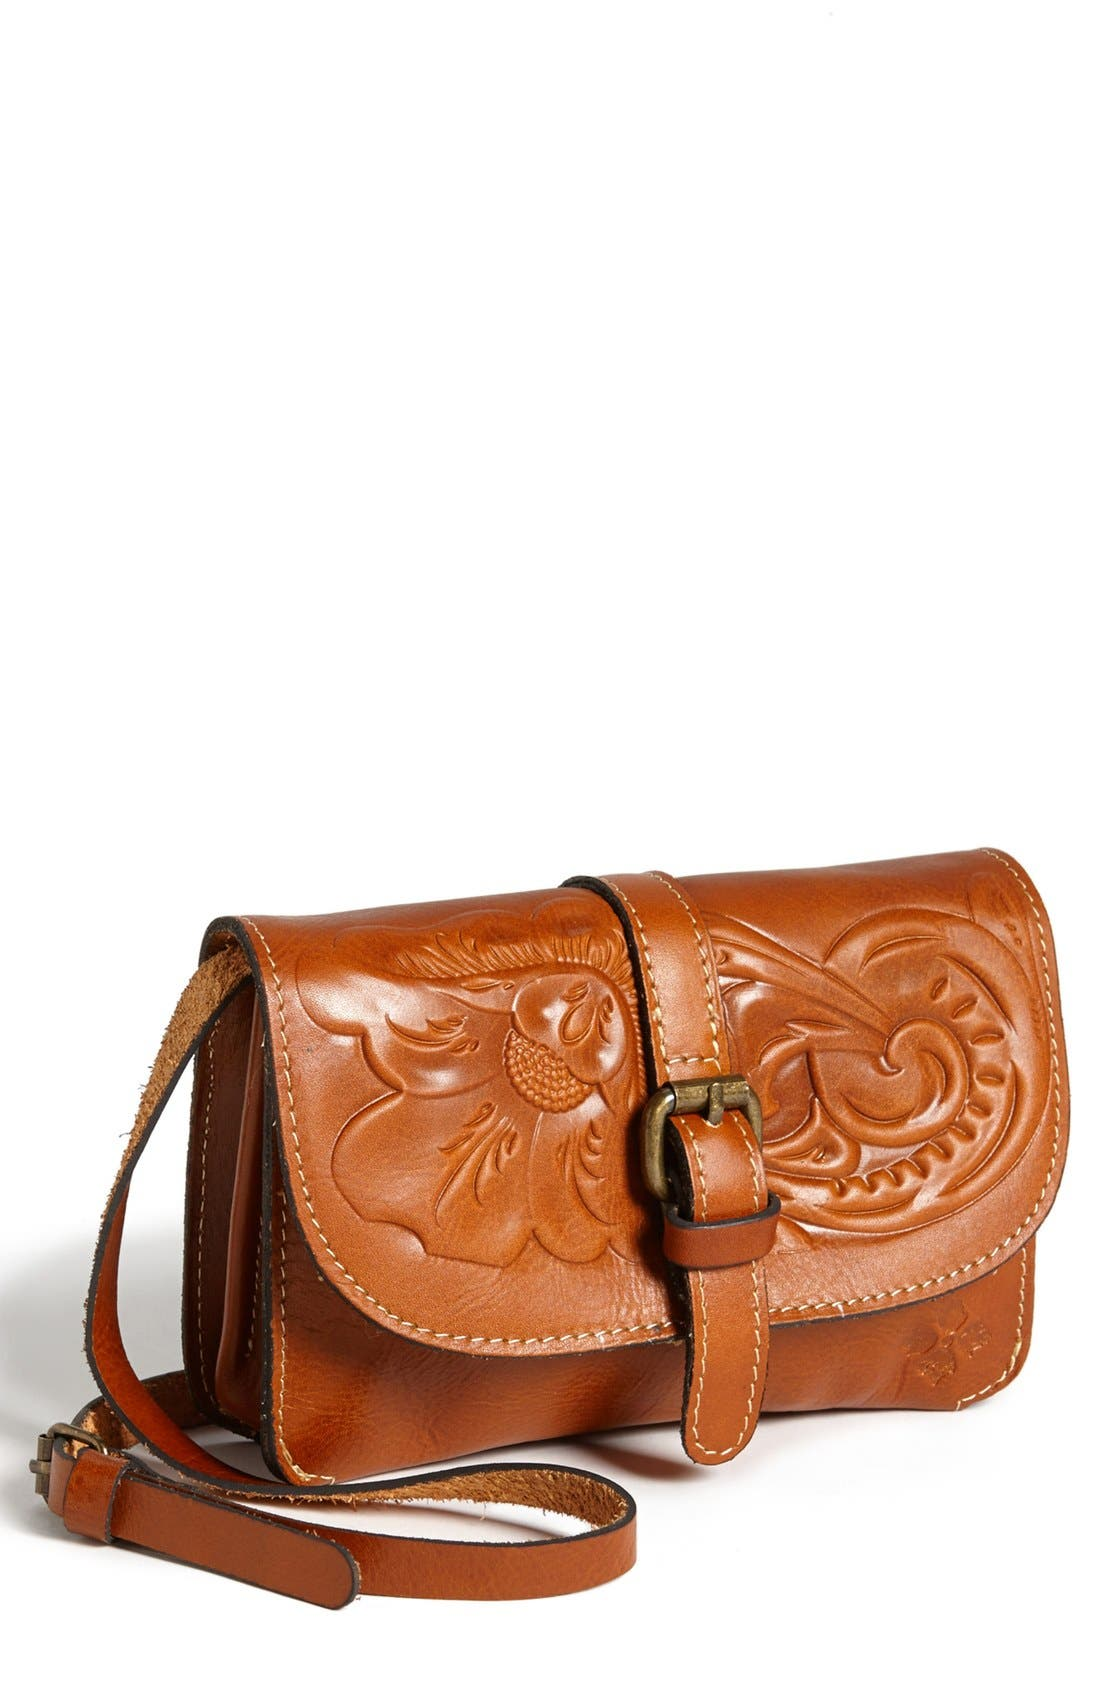 Alternate Image 1 Selected - Patricia Nash 'Torri' Embossed Leather Crossbody Bag